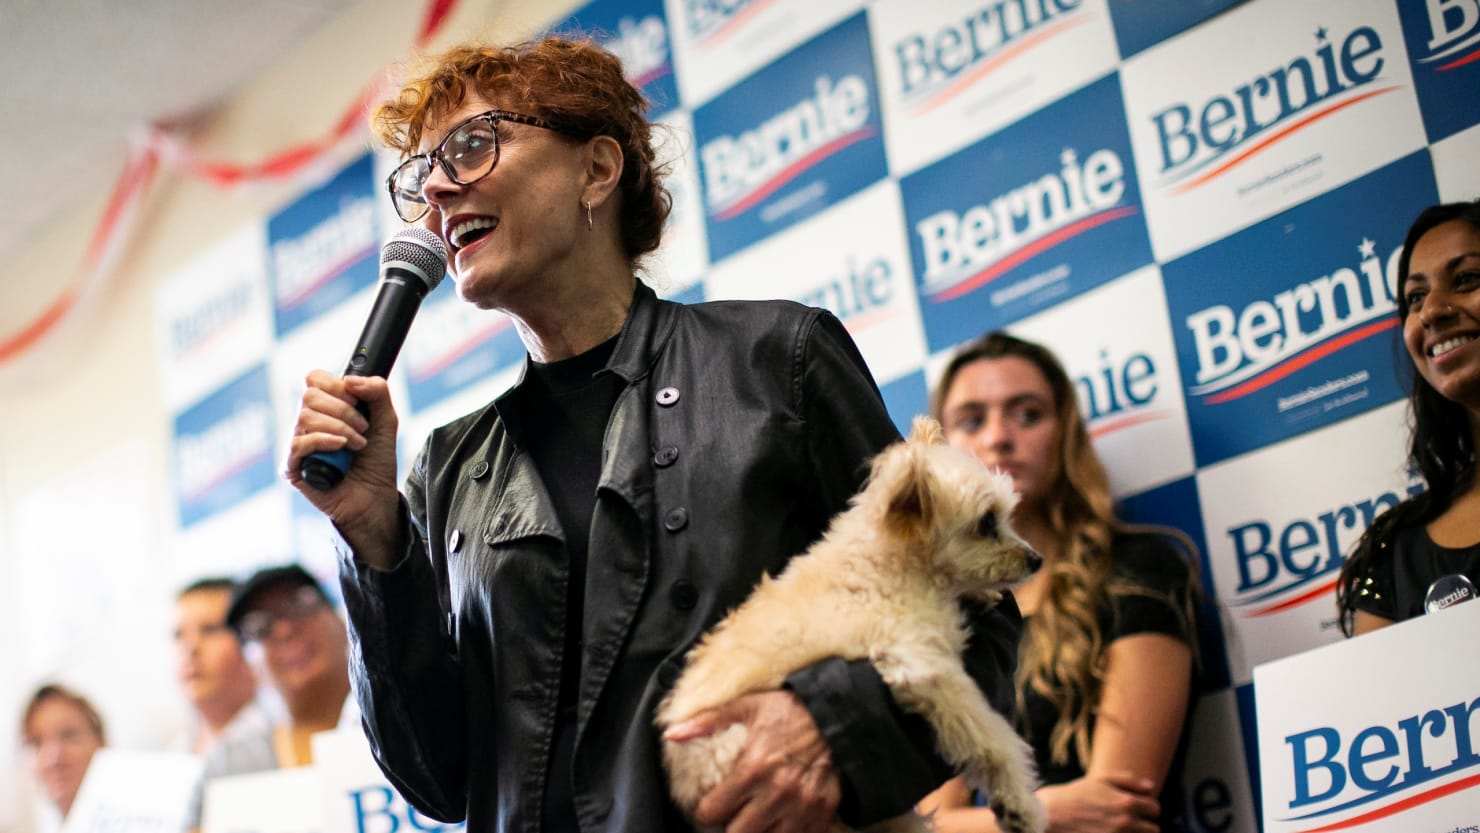 Susan Sarandon Appears to Snipe at Elizabeth Warren While Introducing Bernie Sanders at Iowa Event